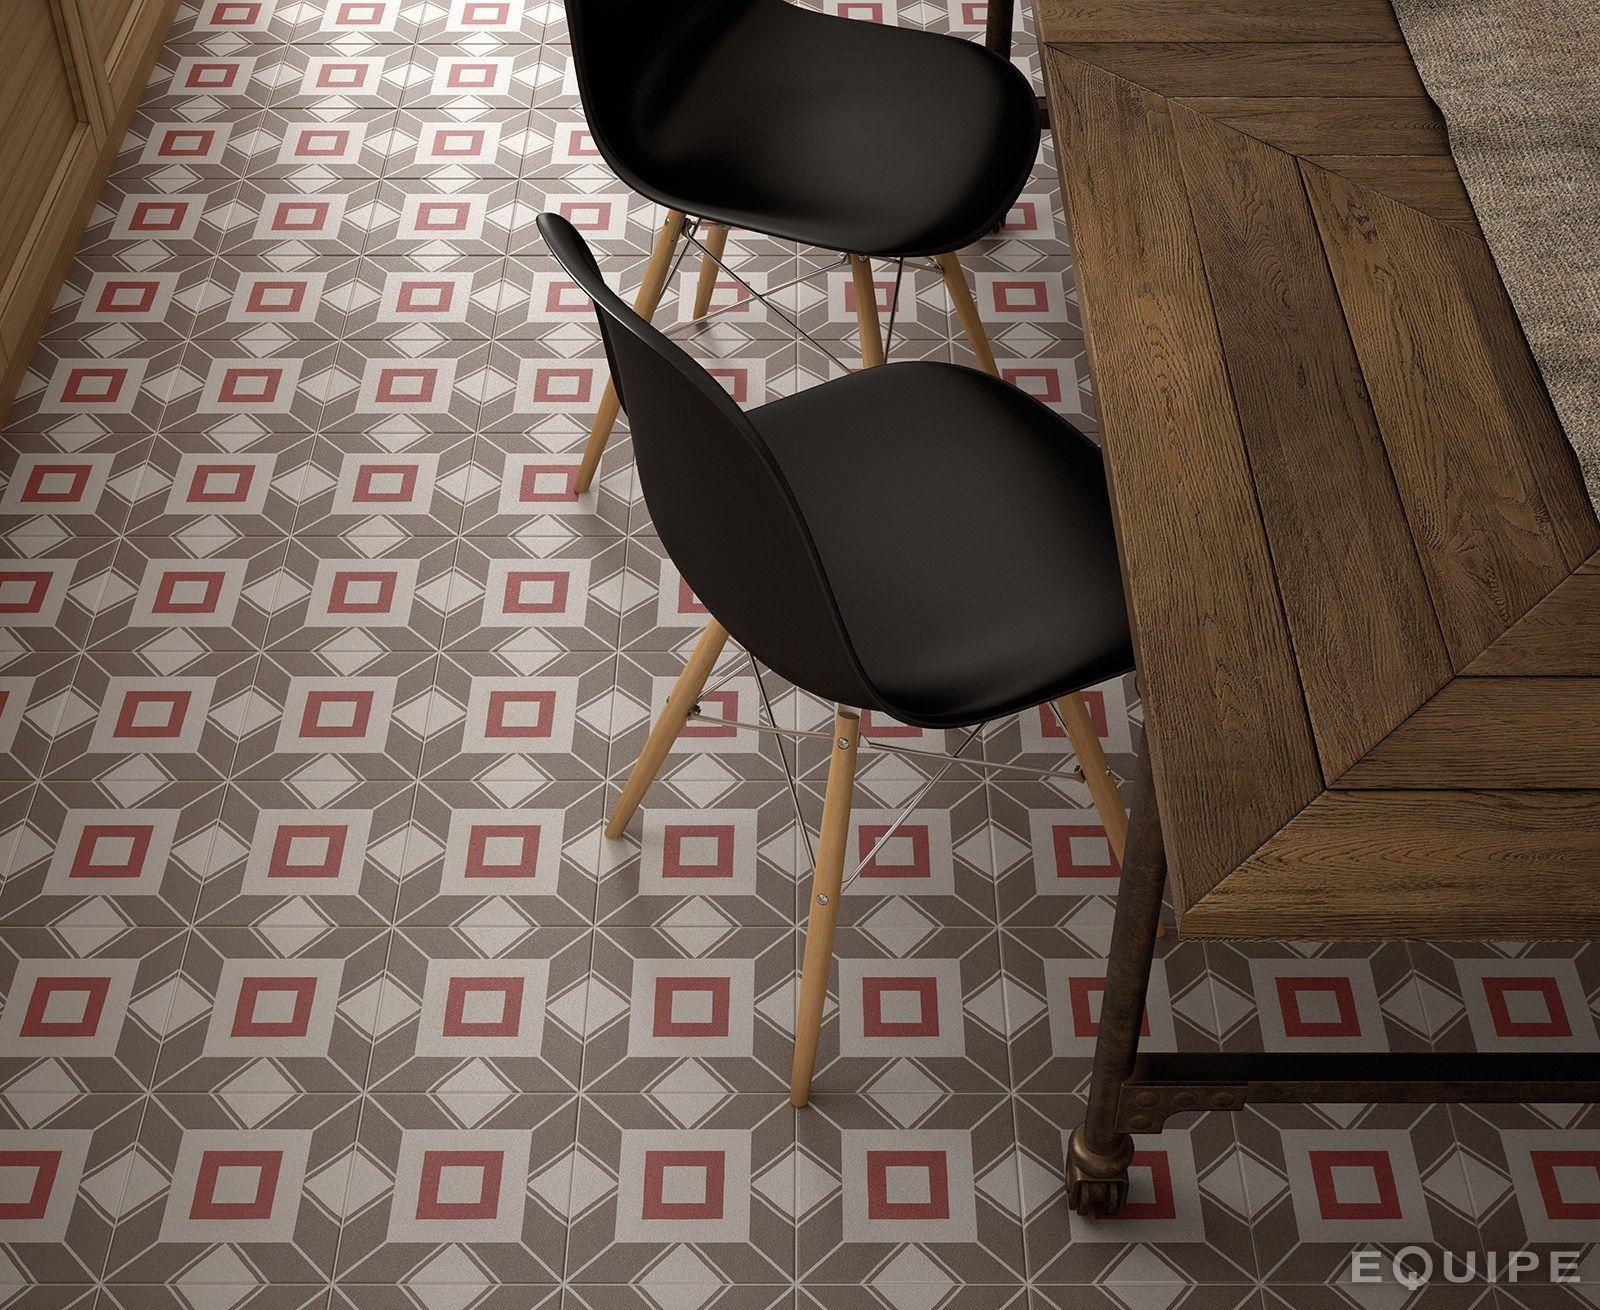 Ceramic wallfloor tiles caprice deco by equipe ceramicas atwood ceramic wallfloor tiles caprice deco by equipe ceramicas dailygadgetfo Gallery